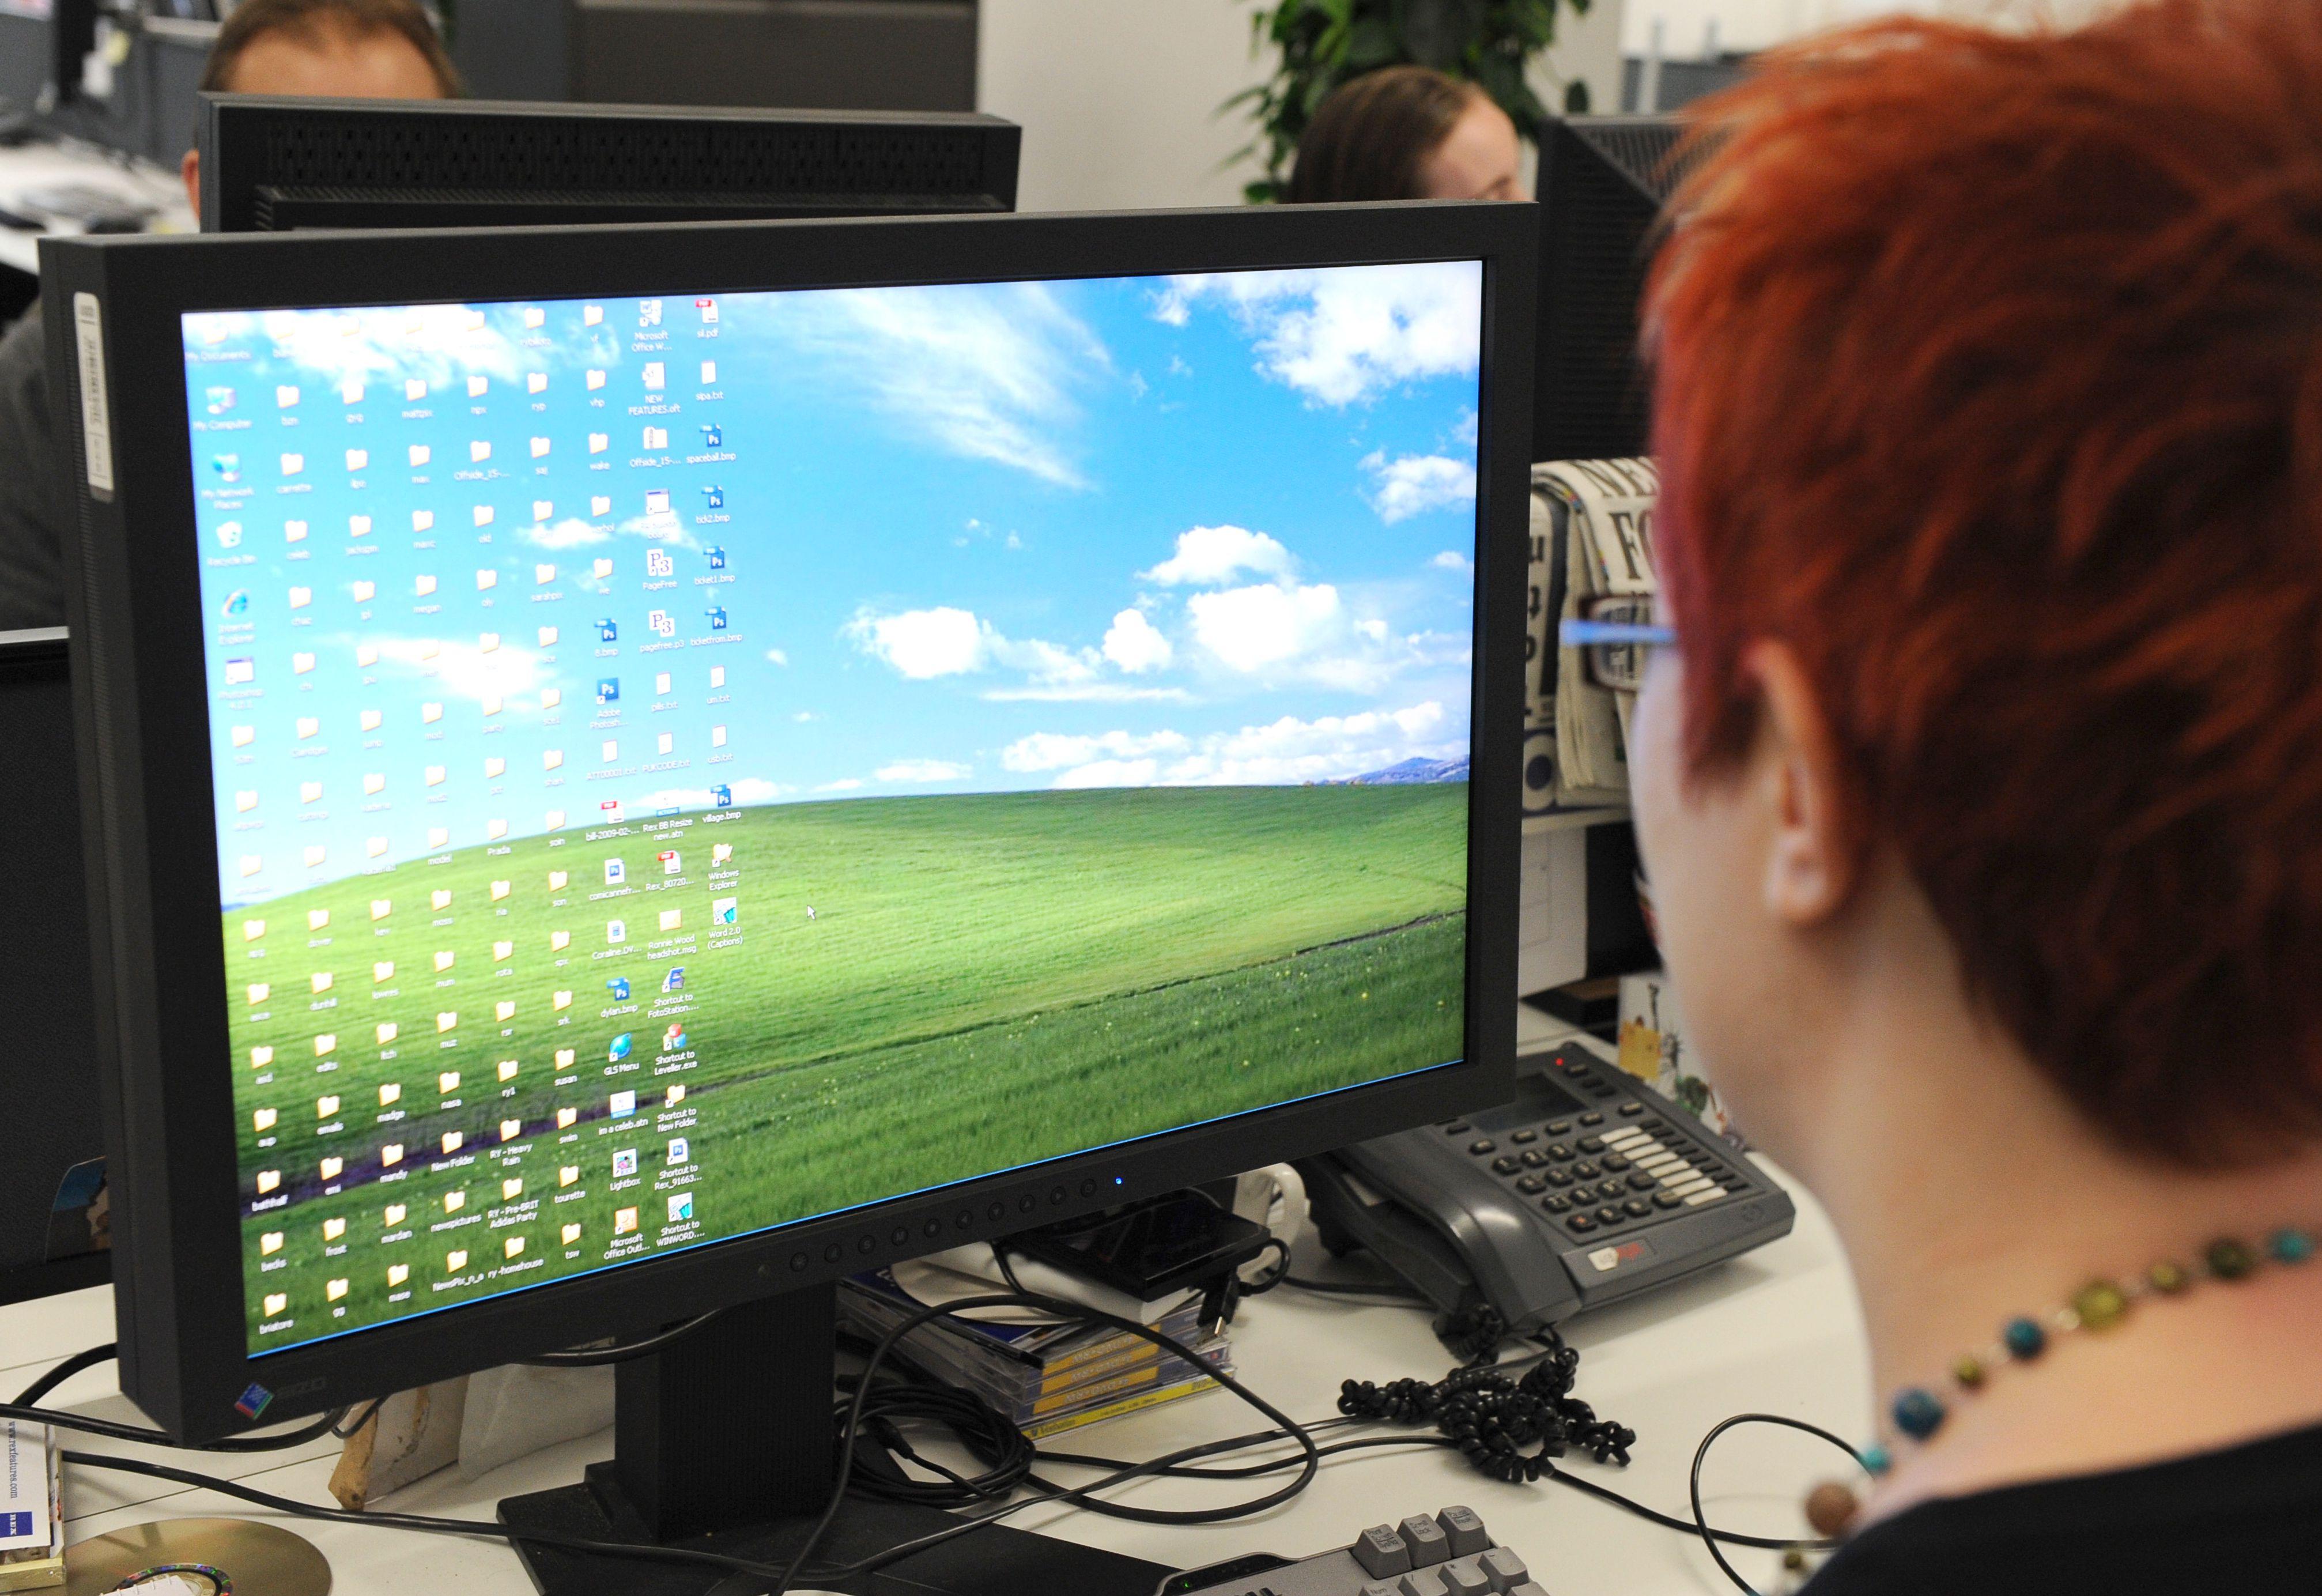 Office Worker Using Microsoft Windows - 11 Mar 2010